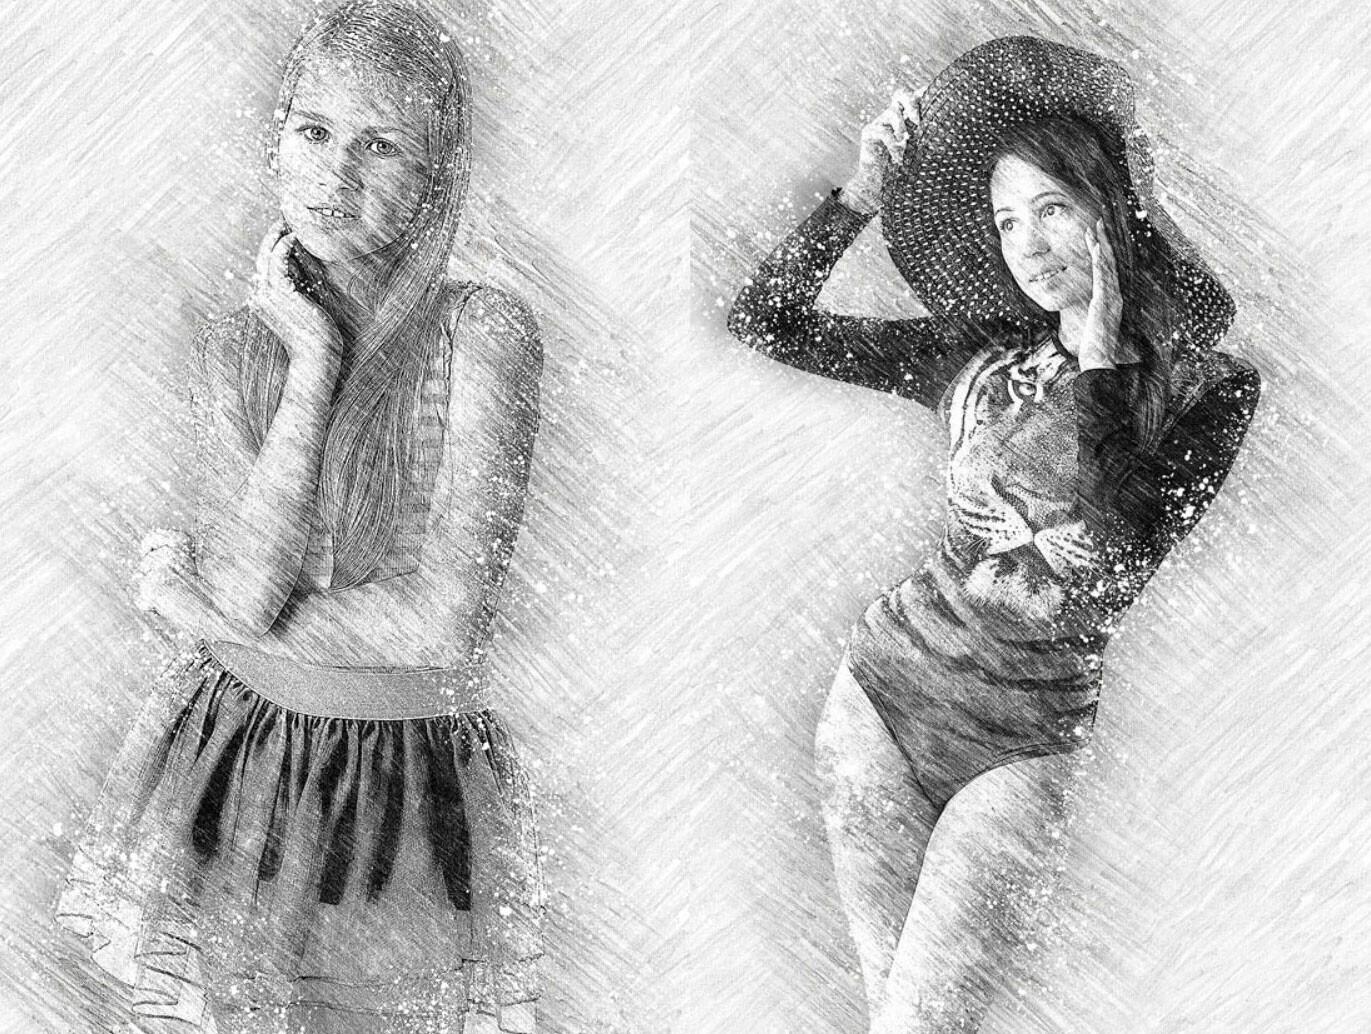 ArtStation   Pencil Drawing Photoshop Action, denis marvin